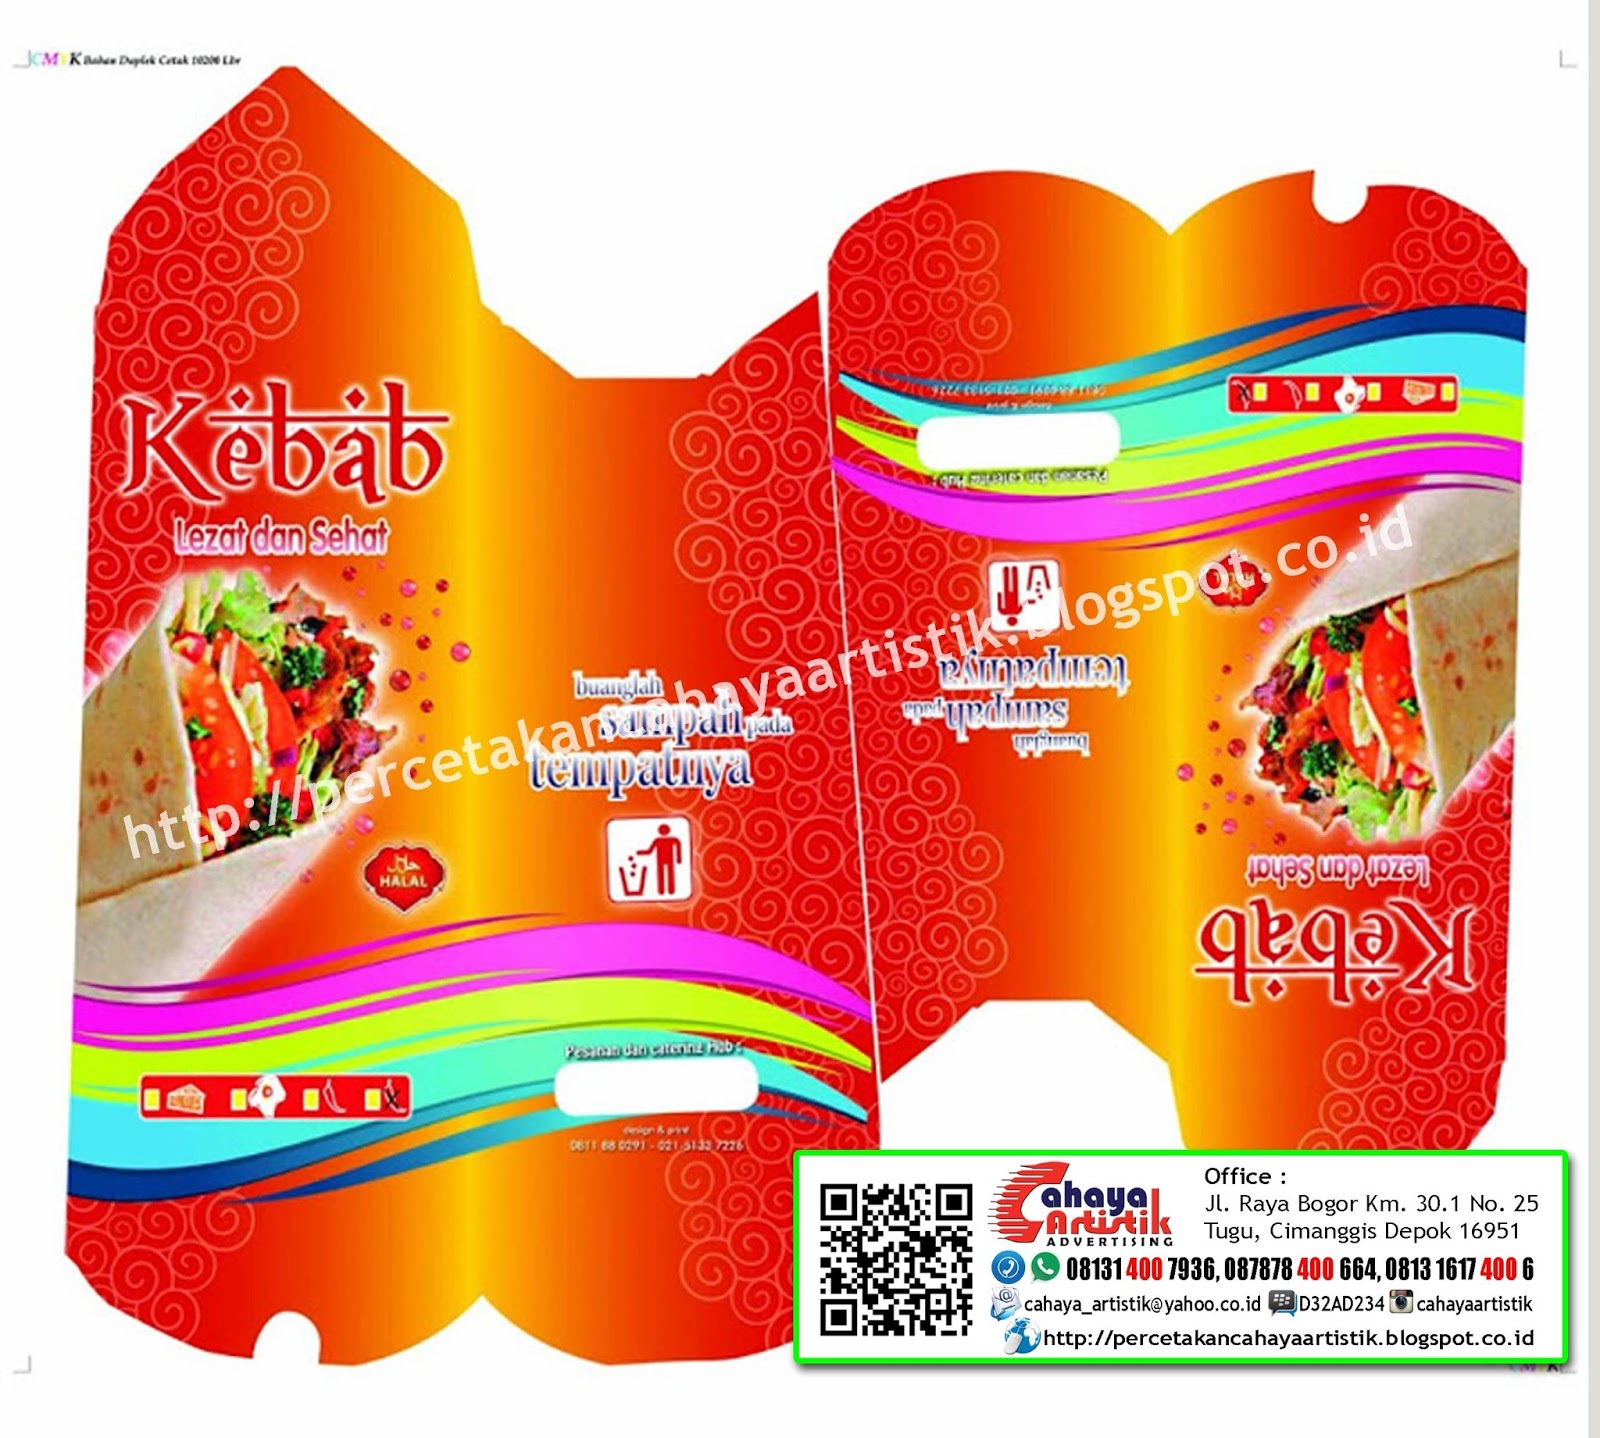 250ml cosmetic tubes free mockup to showcase your packaging design in a photorealistic style. 50 Desain Kemasan Kebab Yang Populer